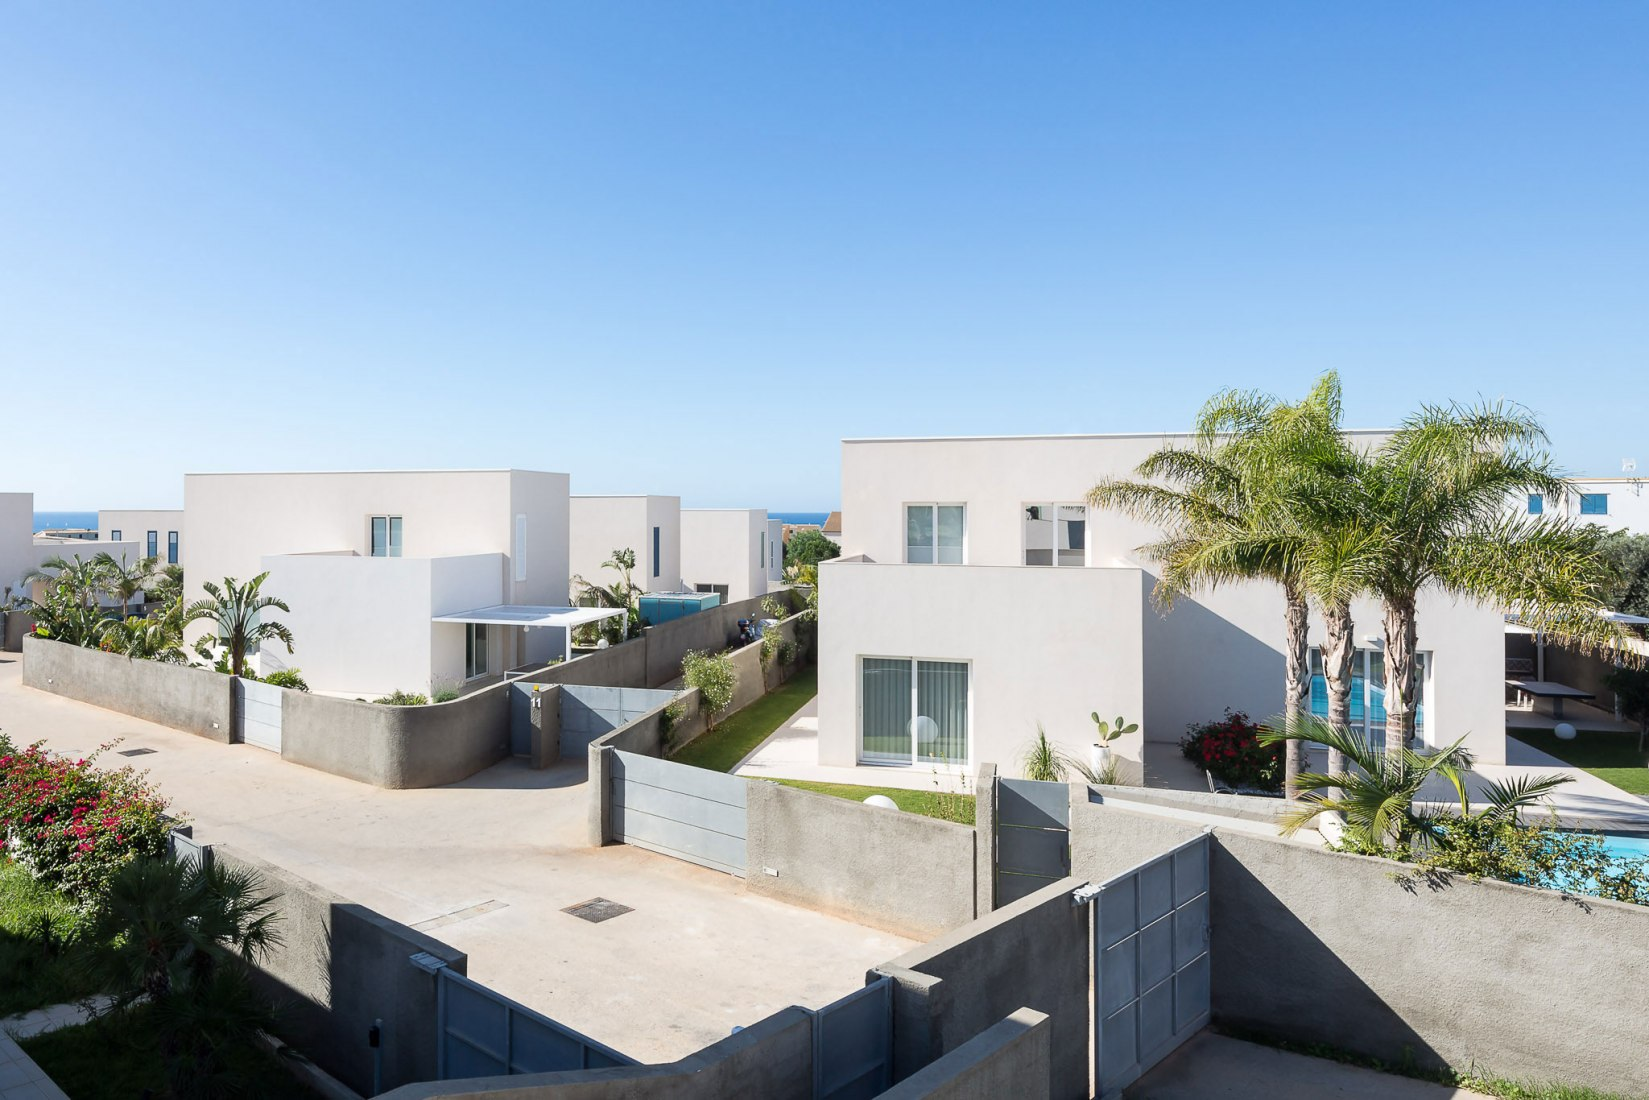 Aerial view. Garden Housing by Nunzio Sciveres and Giuseppe Gurrieri. Photograph by Filippo Poli